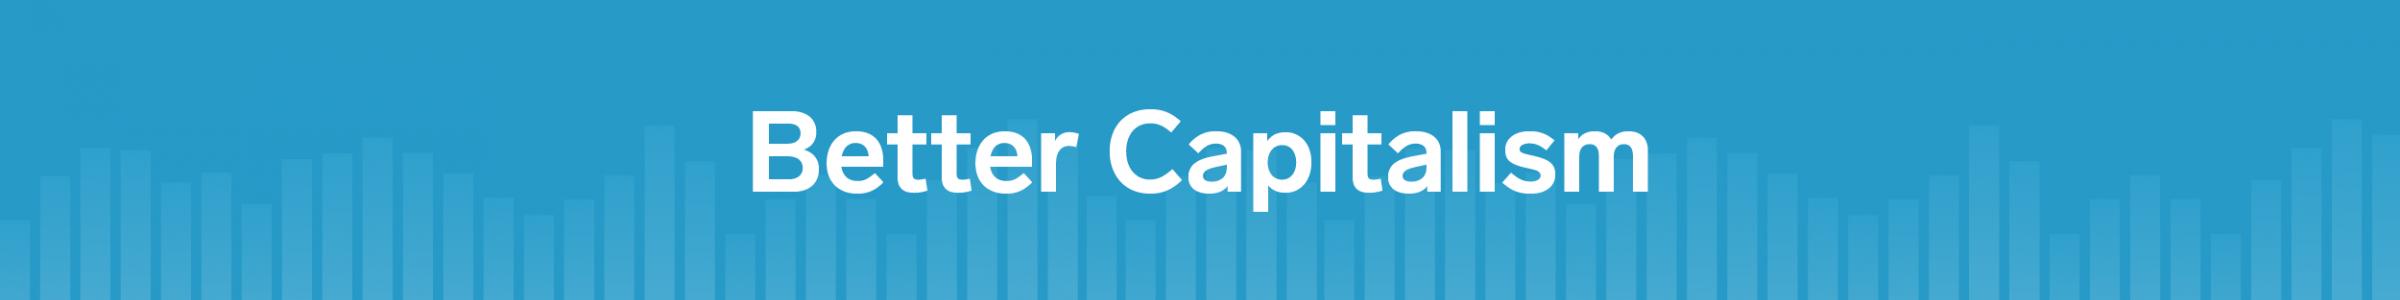 better-capitalism-banner-no-logo